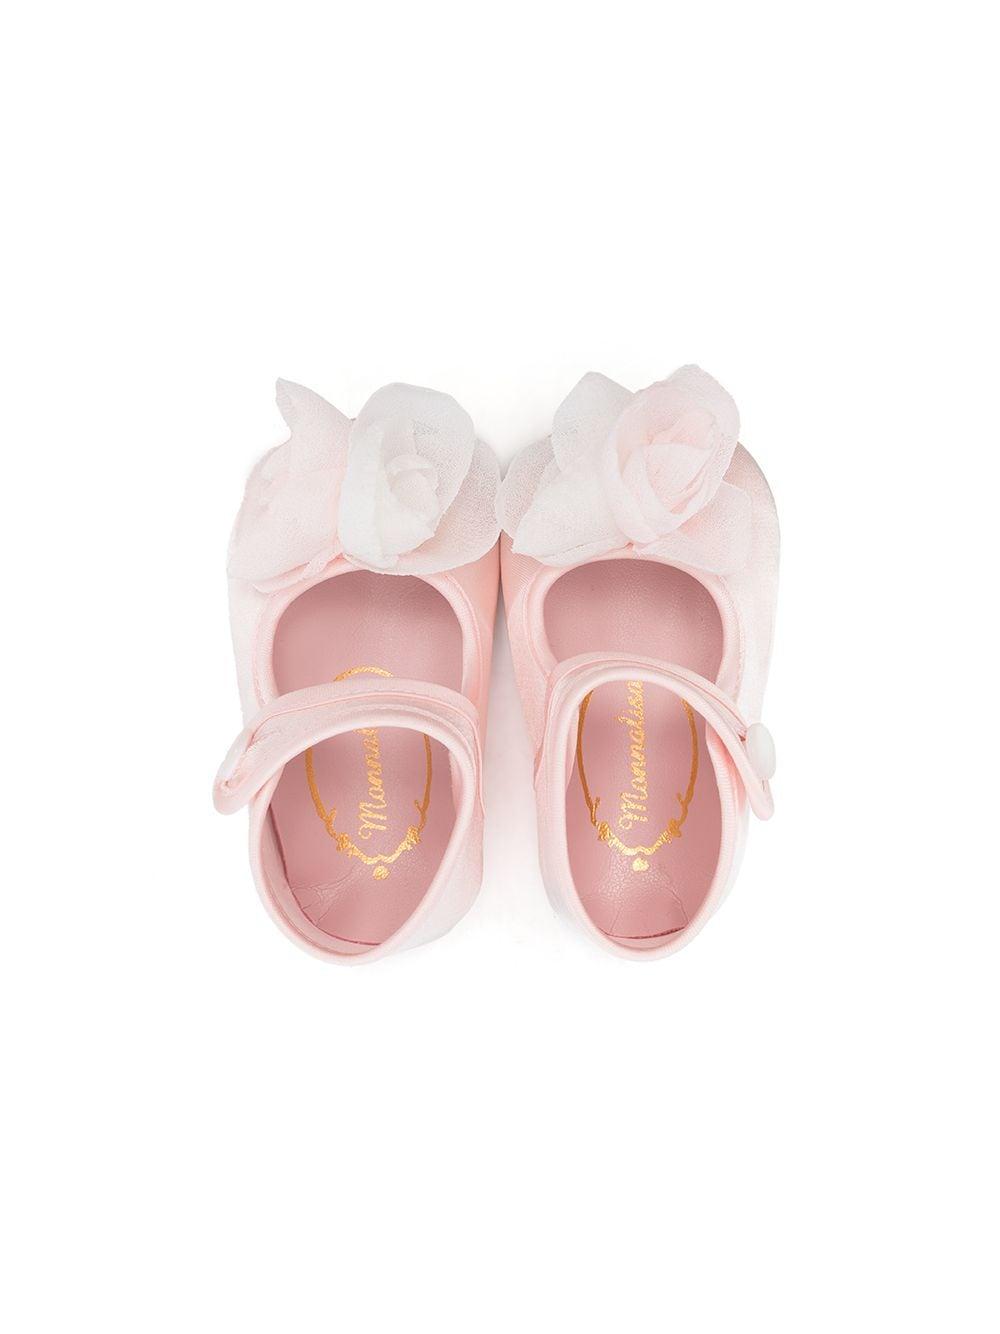 MONNALISA CHIC | Baby shoes | 73700171320092